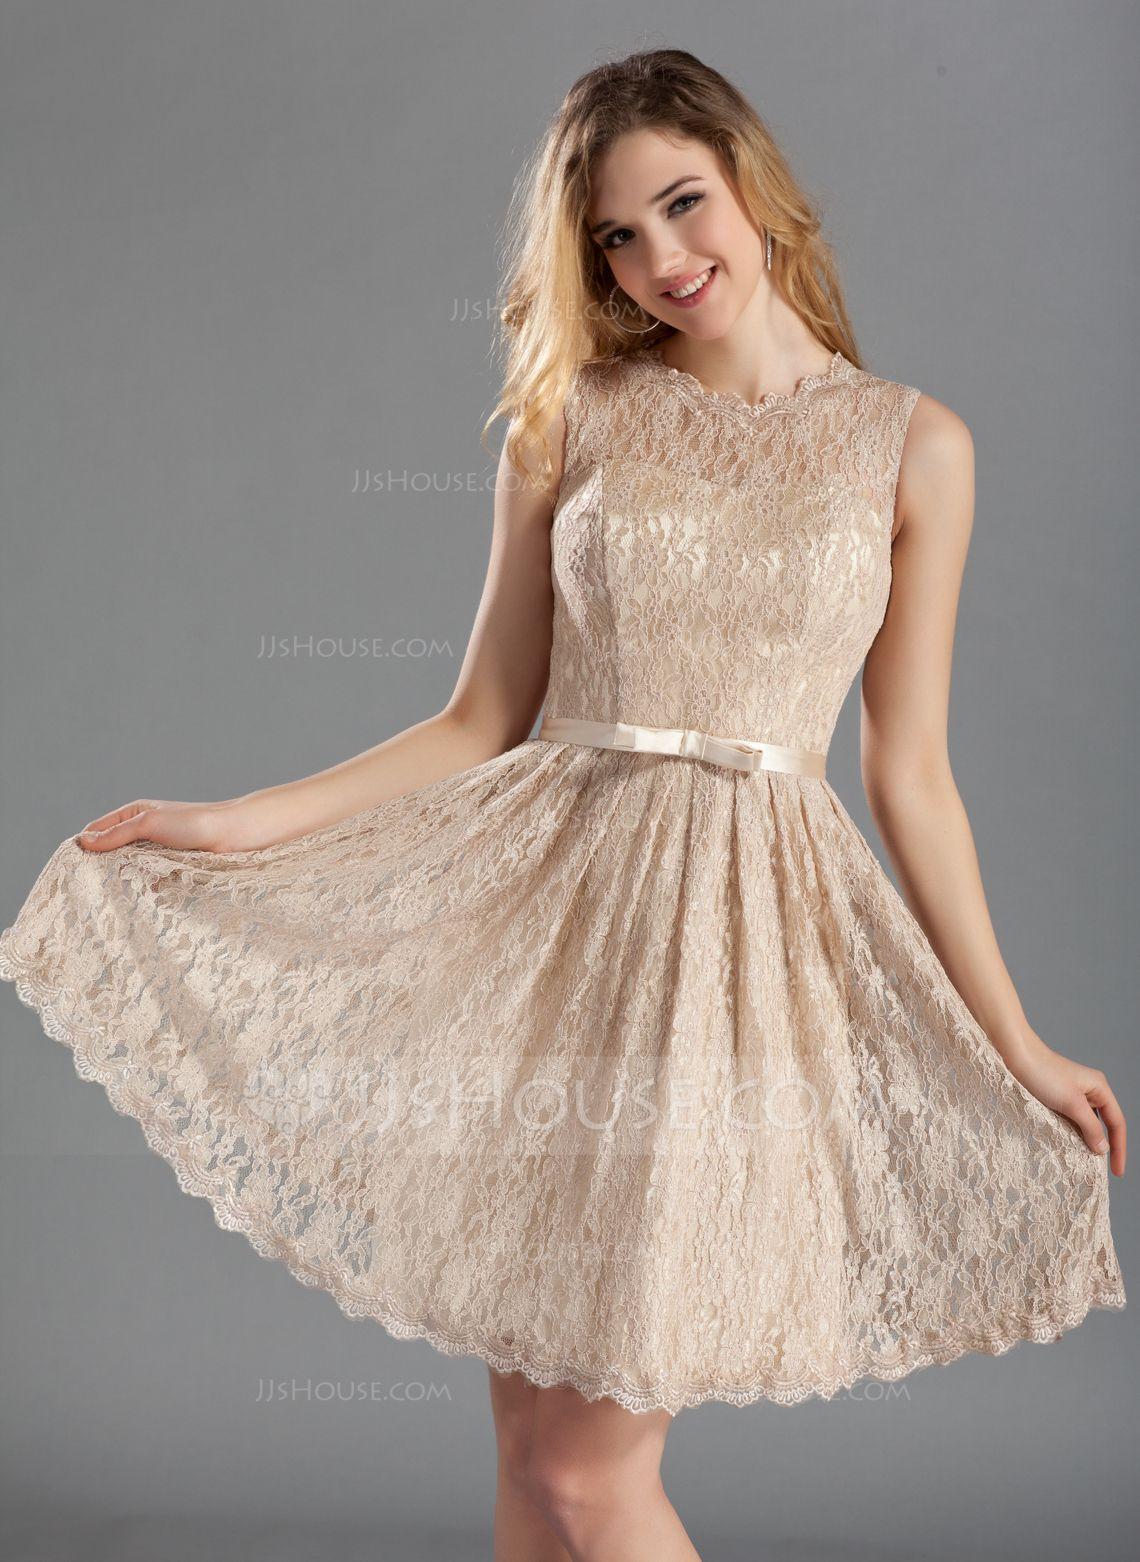 A lineprincess scoop neck knee length charmeuse lace bridesmaid a lineprincess scoop neck knee length charmeuse lace bridesmaid dress with bow ombrellifo Images